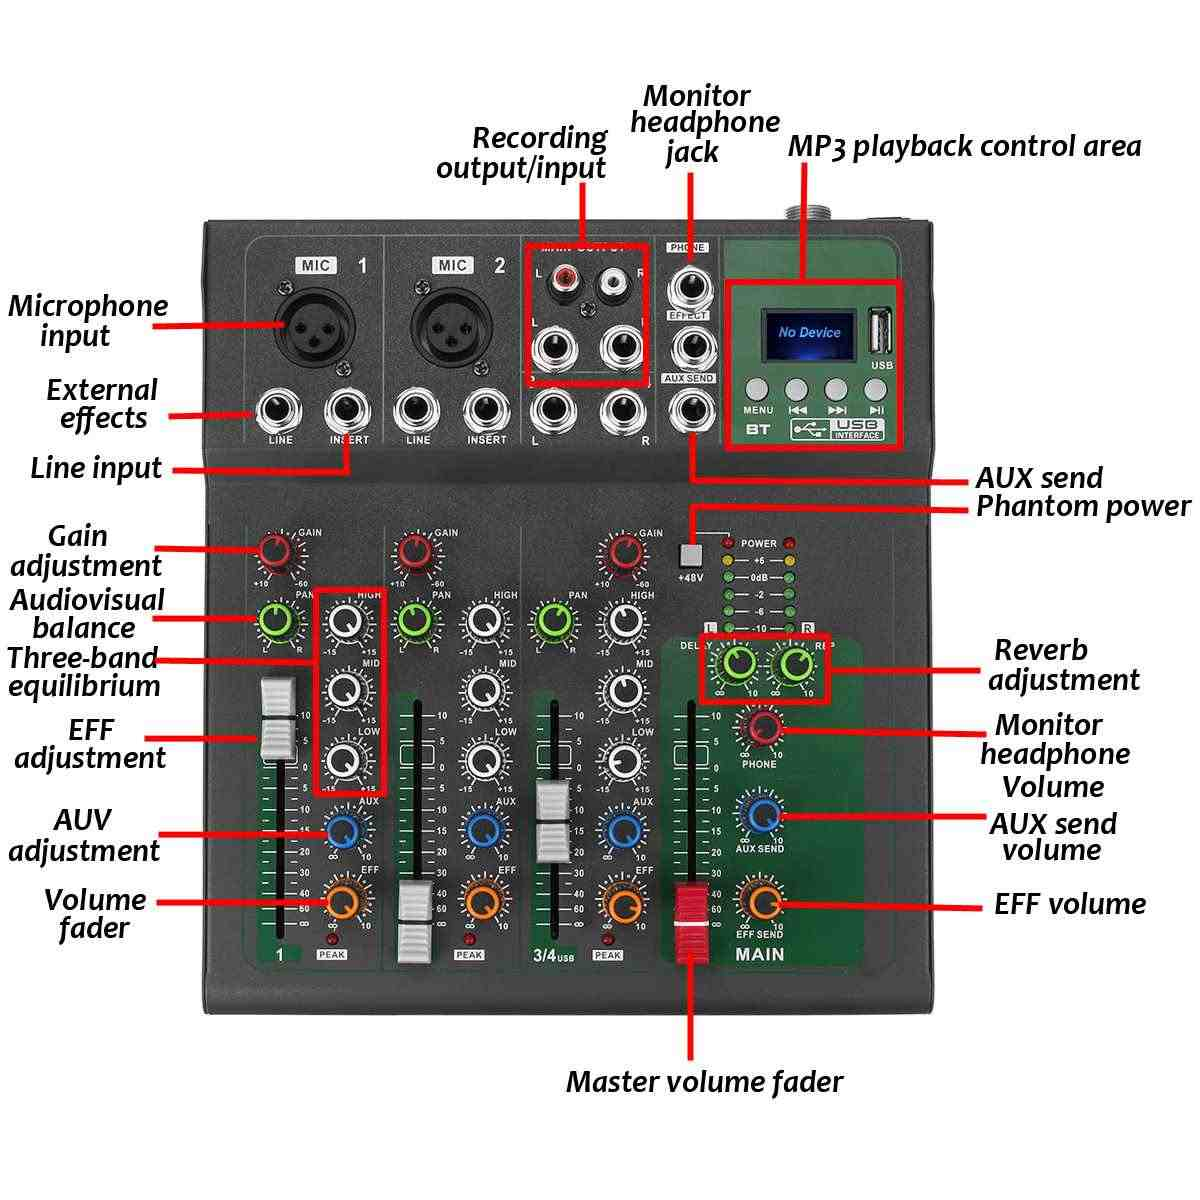 Bluetooth ポータブルオーディオミキサー w/USB Dj サウンドミキシングコンソール MP3 ジャック 4 チャンネルカラオケ 48V アンプカラオケ KTV 一致パーティー